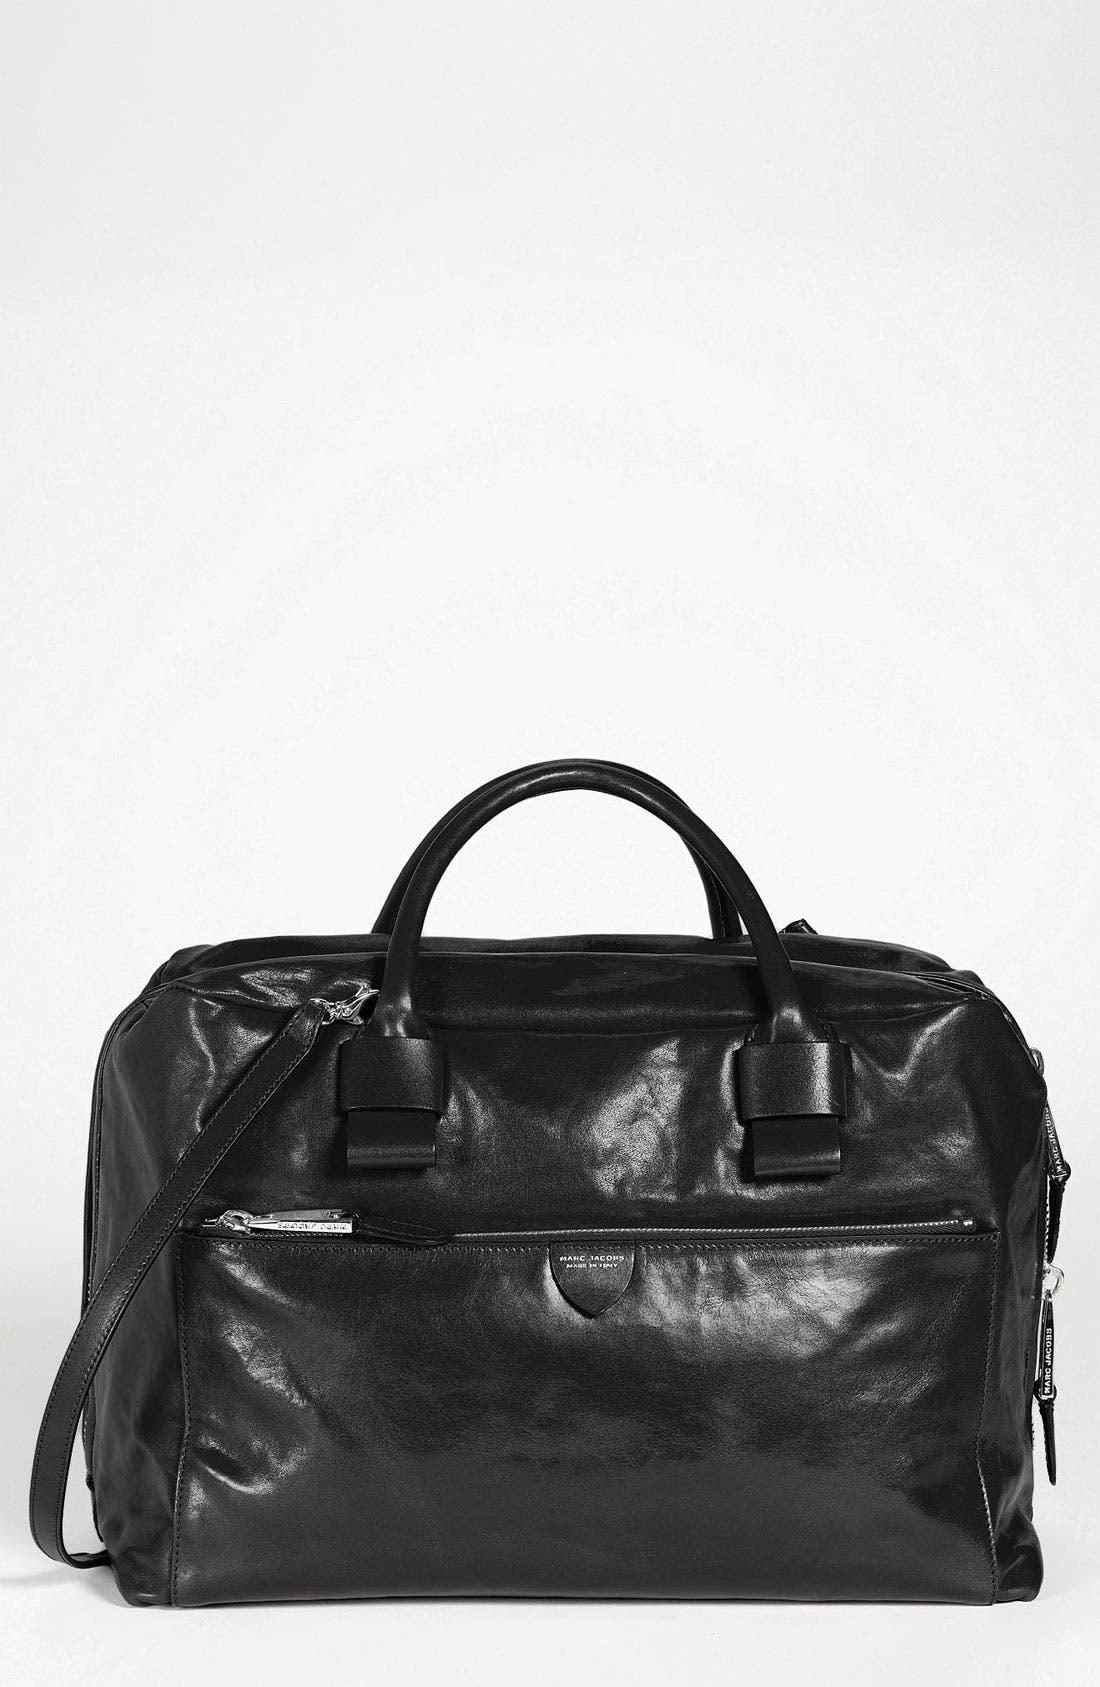 MARC JACOBS 'Antonia'  Leather Satchel, Main, color, 001